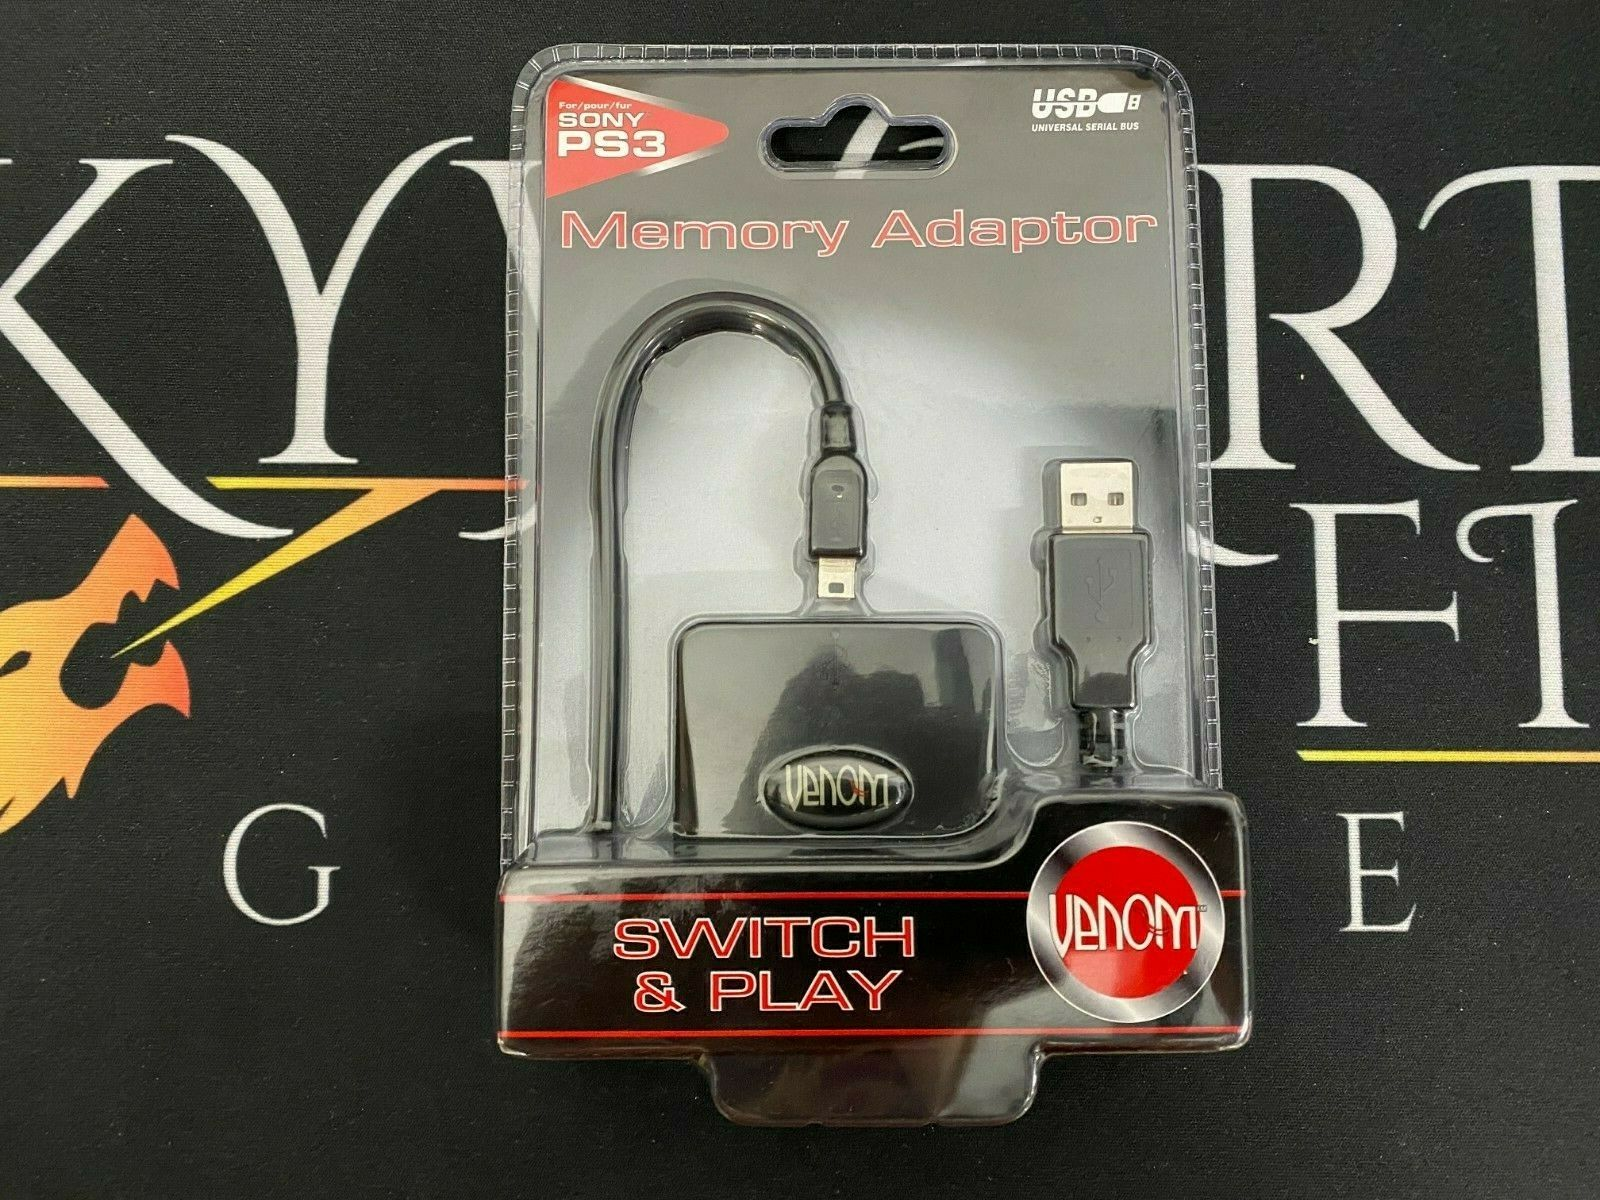 NEW Third Party Playstation Memory Card Adapter - Playstation 3 (SEALED/NEW)